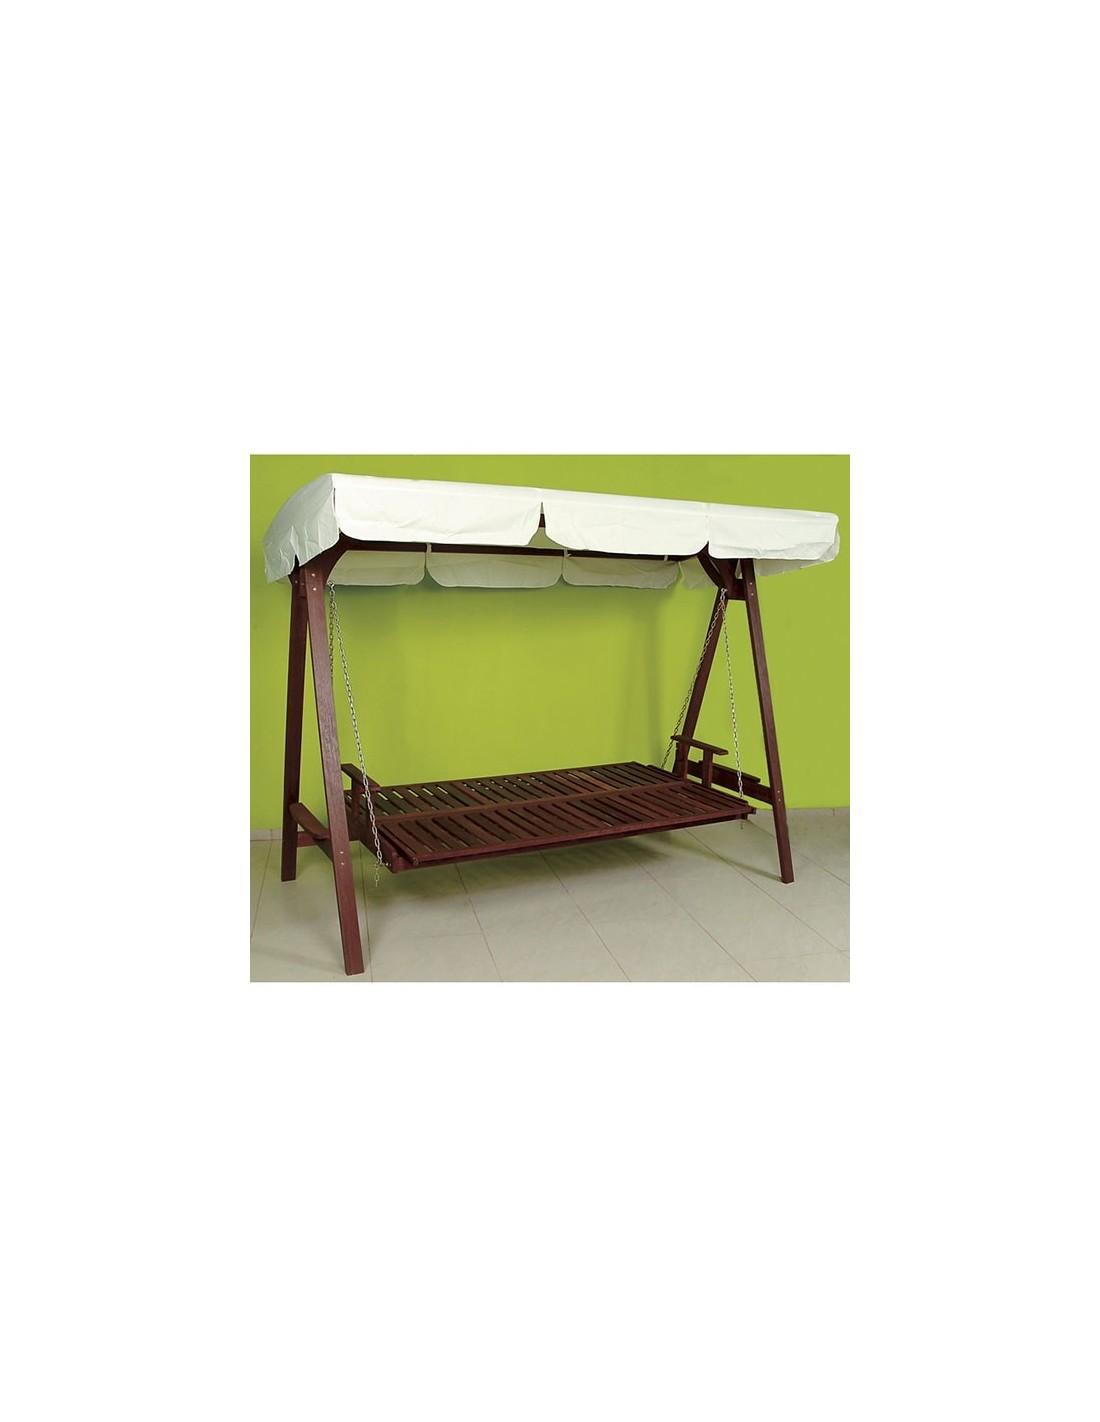 bd2a716f069 Κούνια / Κρεβάτι ξύλινη Κήπου Βεράντας- έπιπλα κήπου